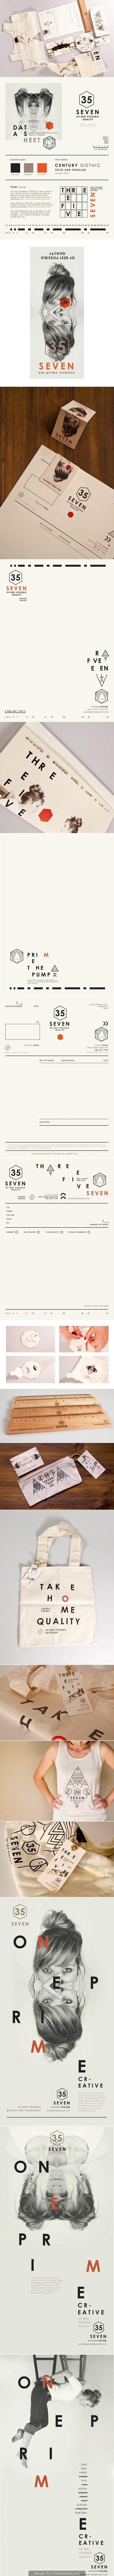 http://www.pinterest.com/pin/187180928237458513/ #brand #identity